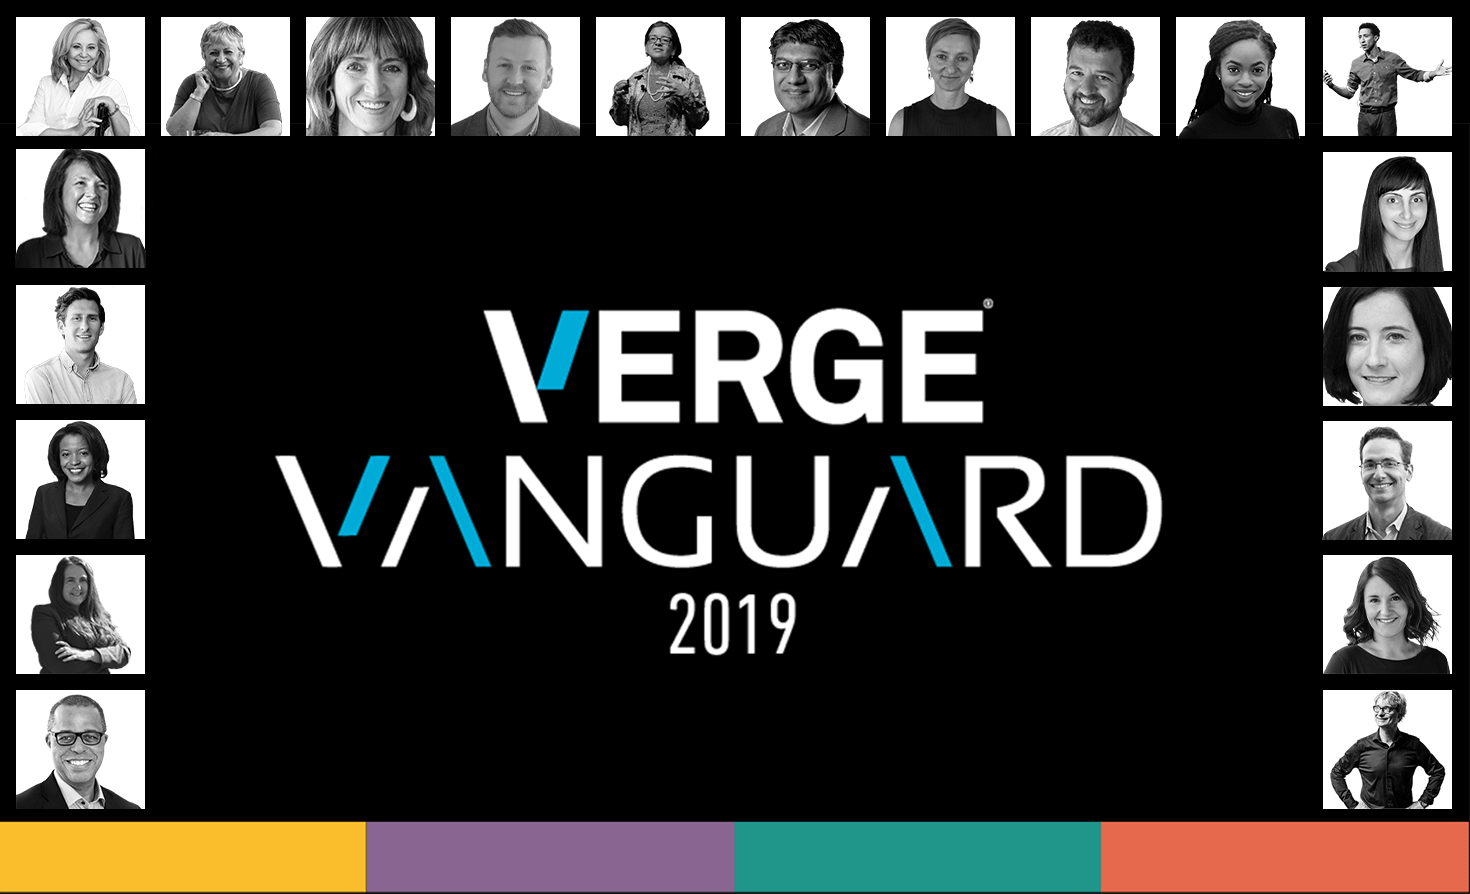 The 2019 VERGE Vanguard